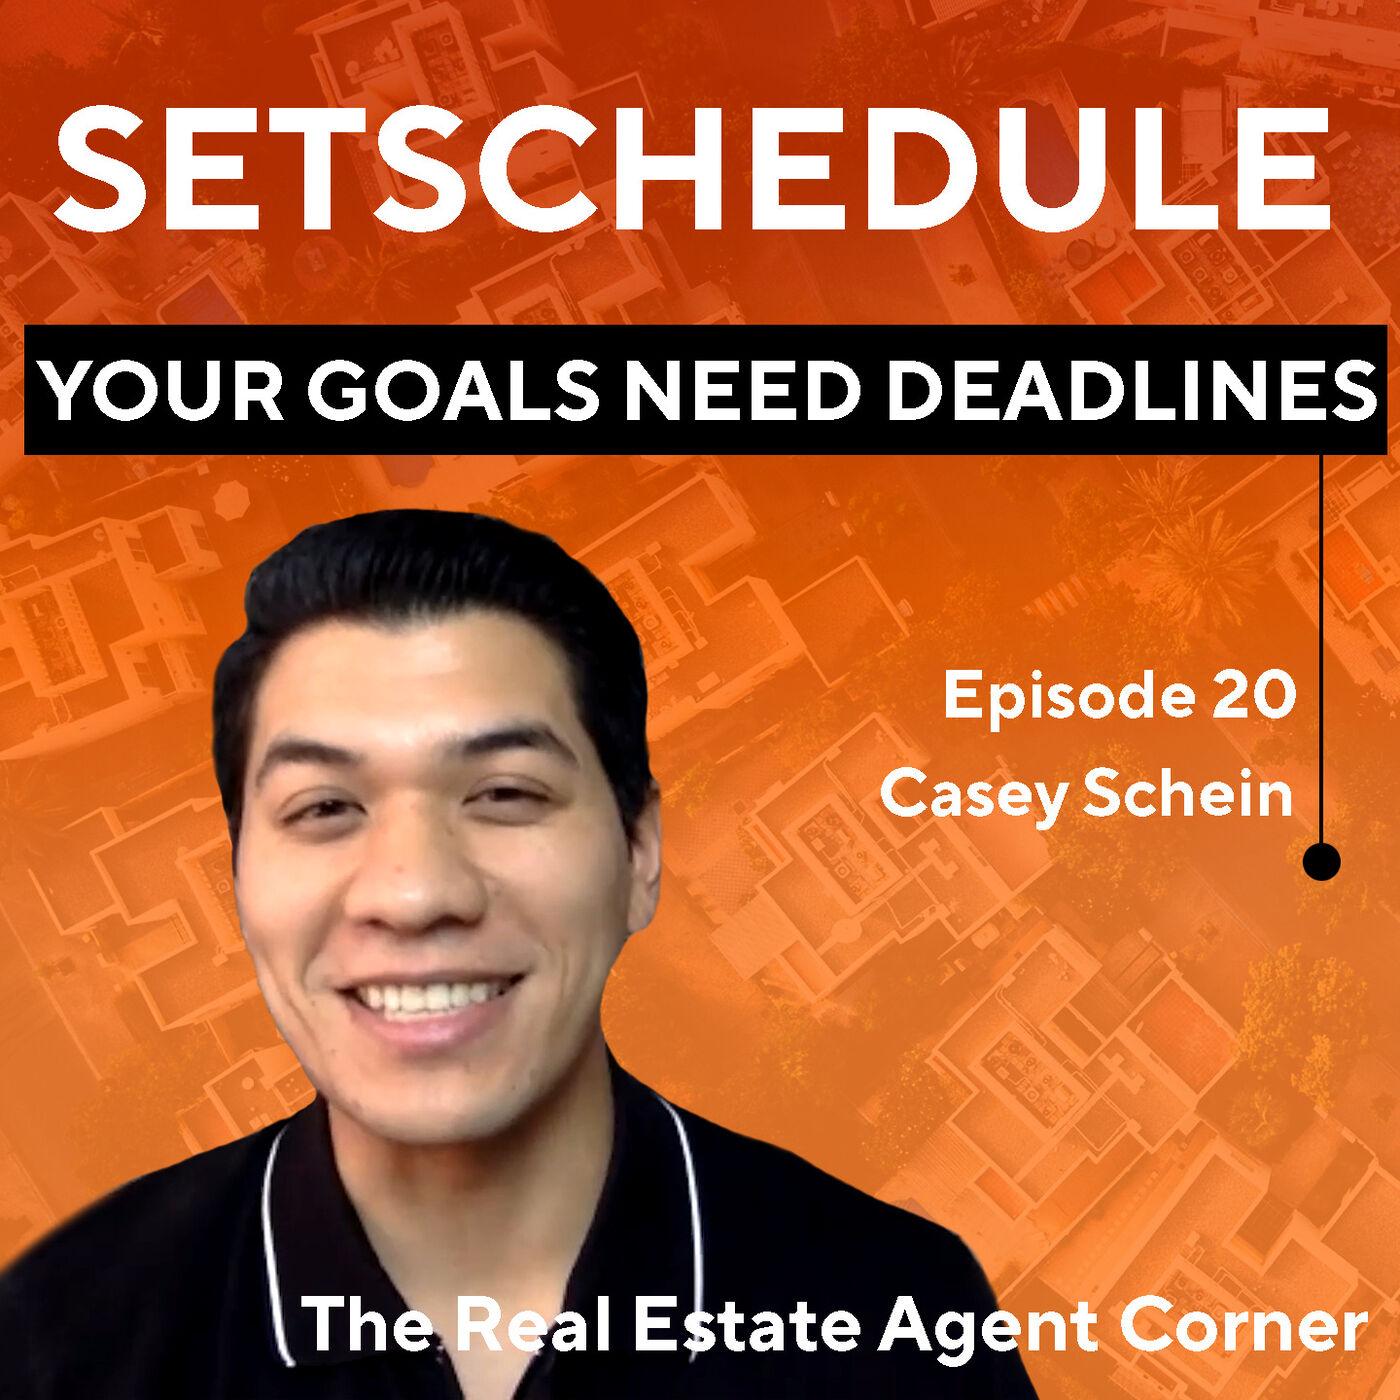 Your Goals Need Deadlines! with Casey Schein